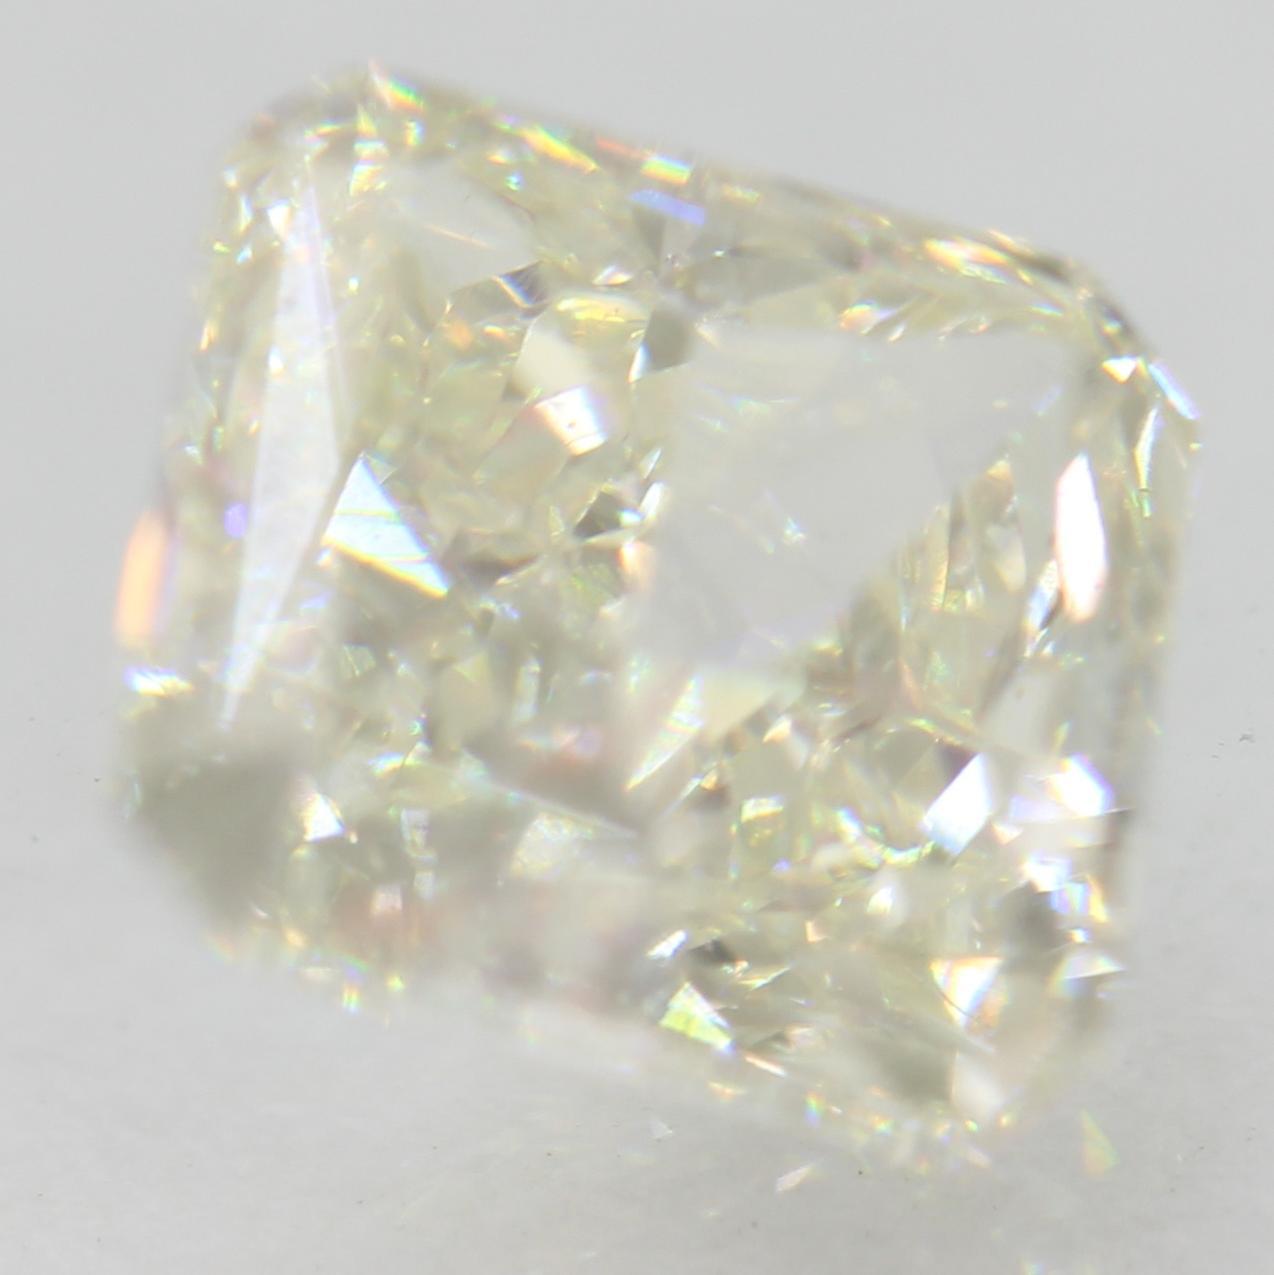 Certified 1.63 Carat H VS2 Radiant Enhanced Natural Loose Diamond 6.62x6.53m 2EX